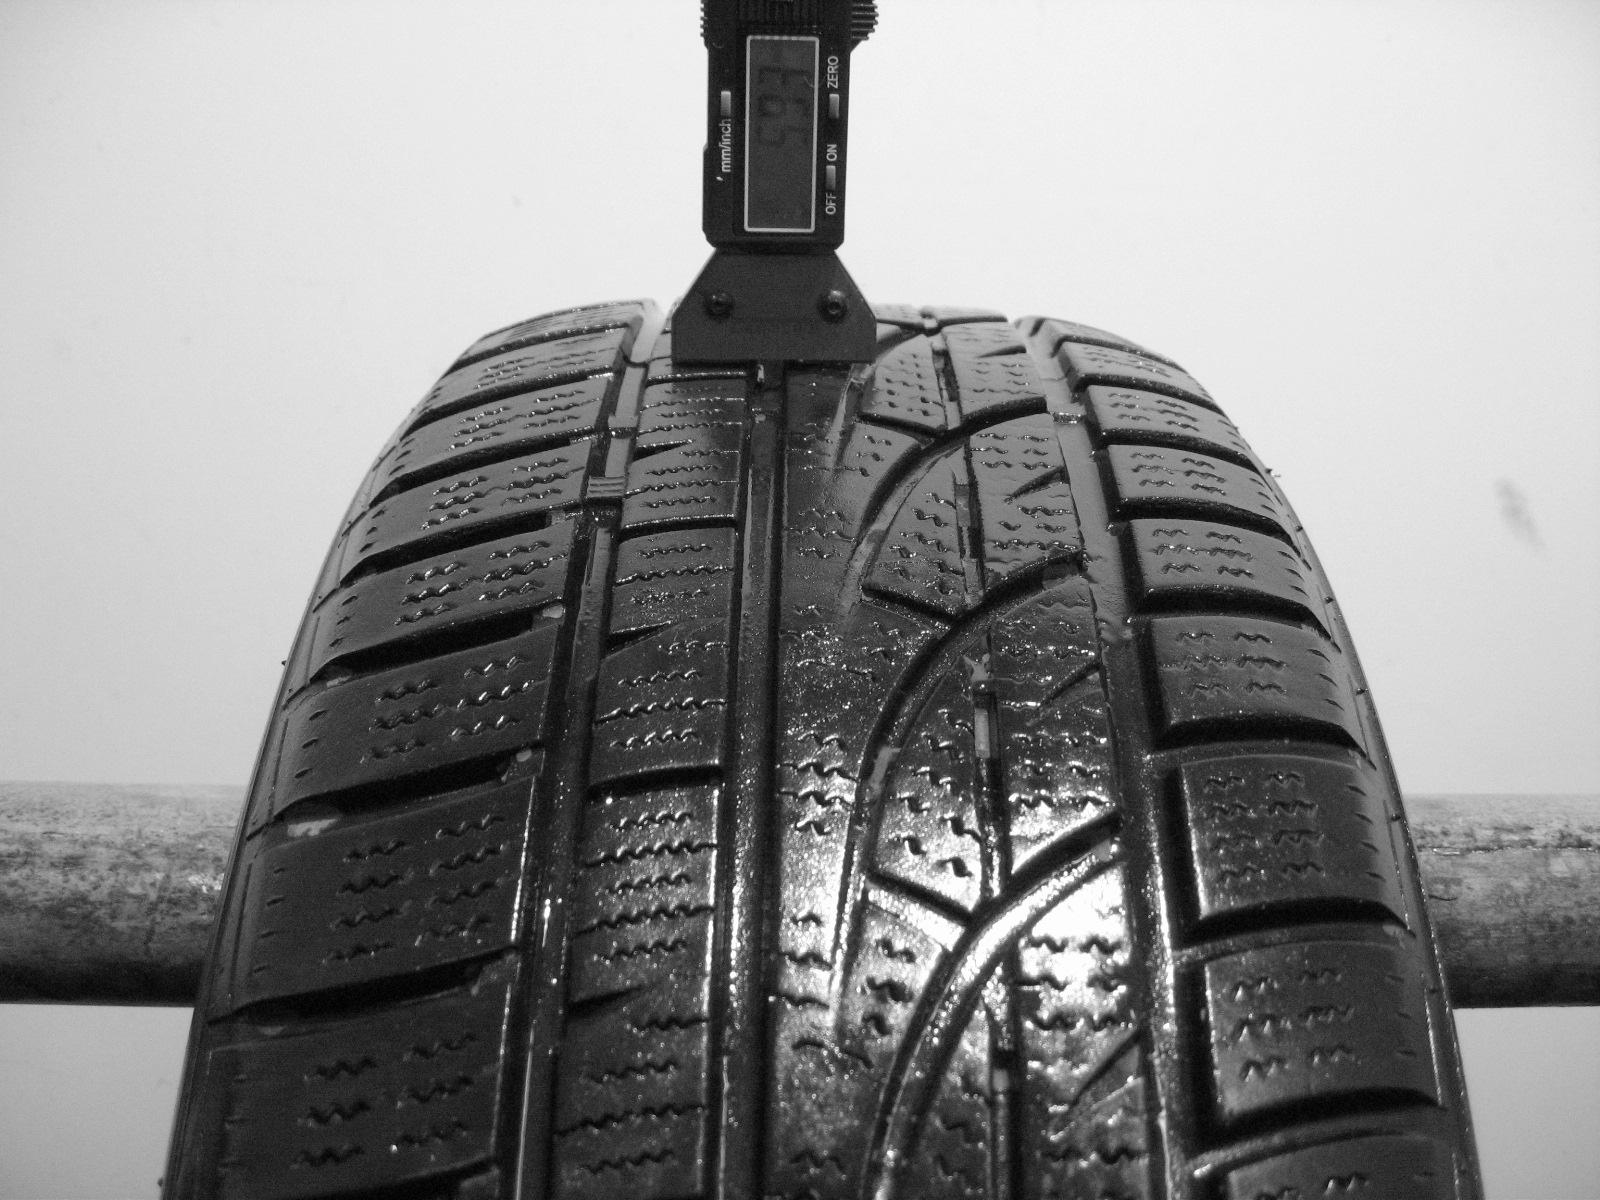 pou it pneu bazar 225 60 r16 kusovka rezerva zimn ojet pneu. Black Bedroom Furniture Sets. Home Design Ideas